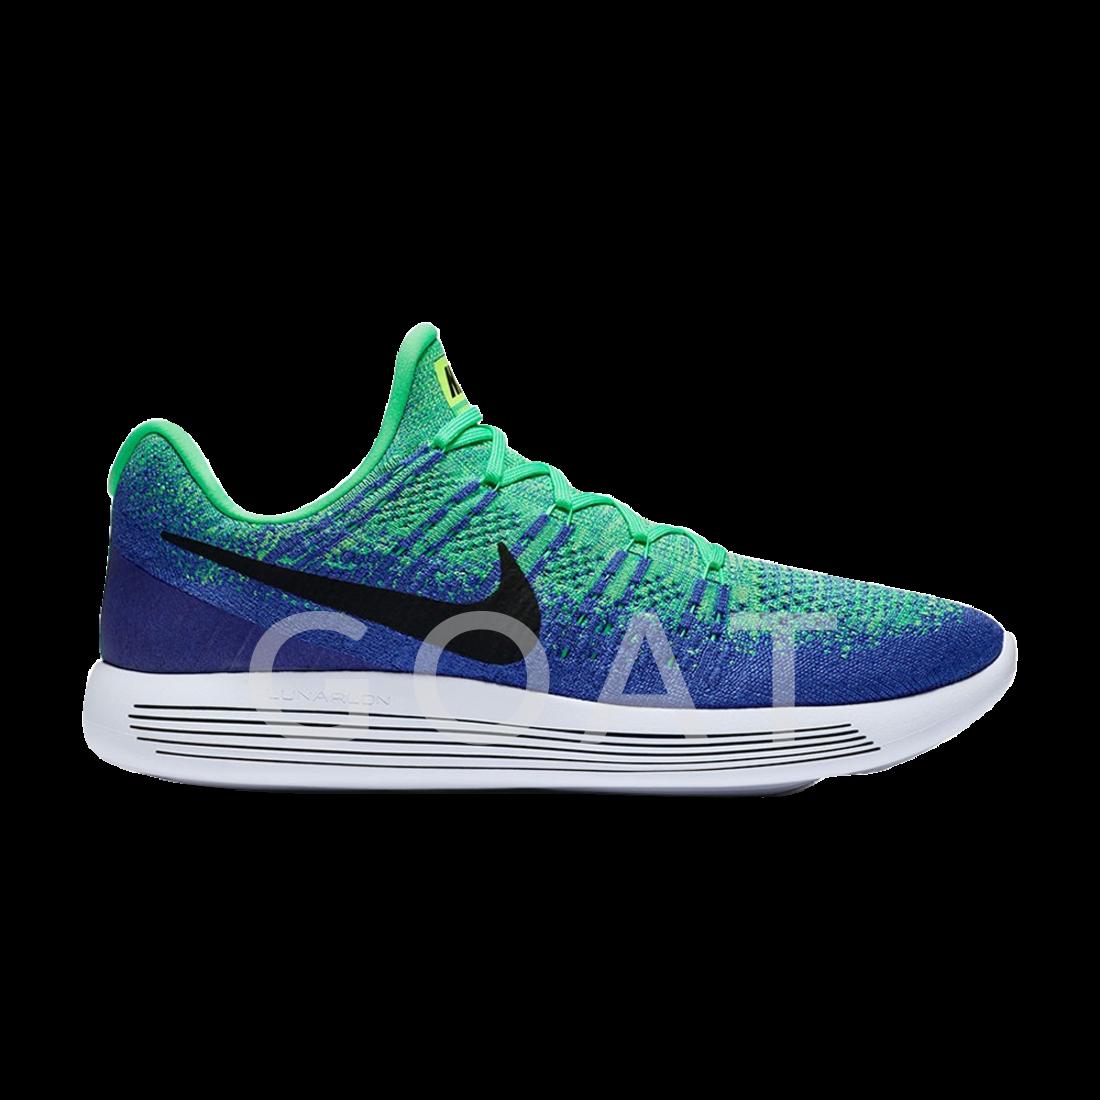 f5c404ac9c85b LunarEpic Low Flyknit 2 - Nike - 863779 301 - electro green black-blue.  GoatsSneakerSlippersSneakersPlimsoll ShoeTrainersGoat